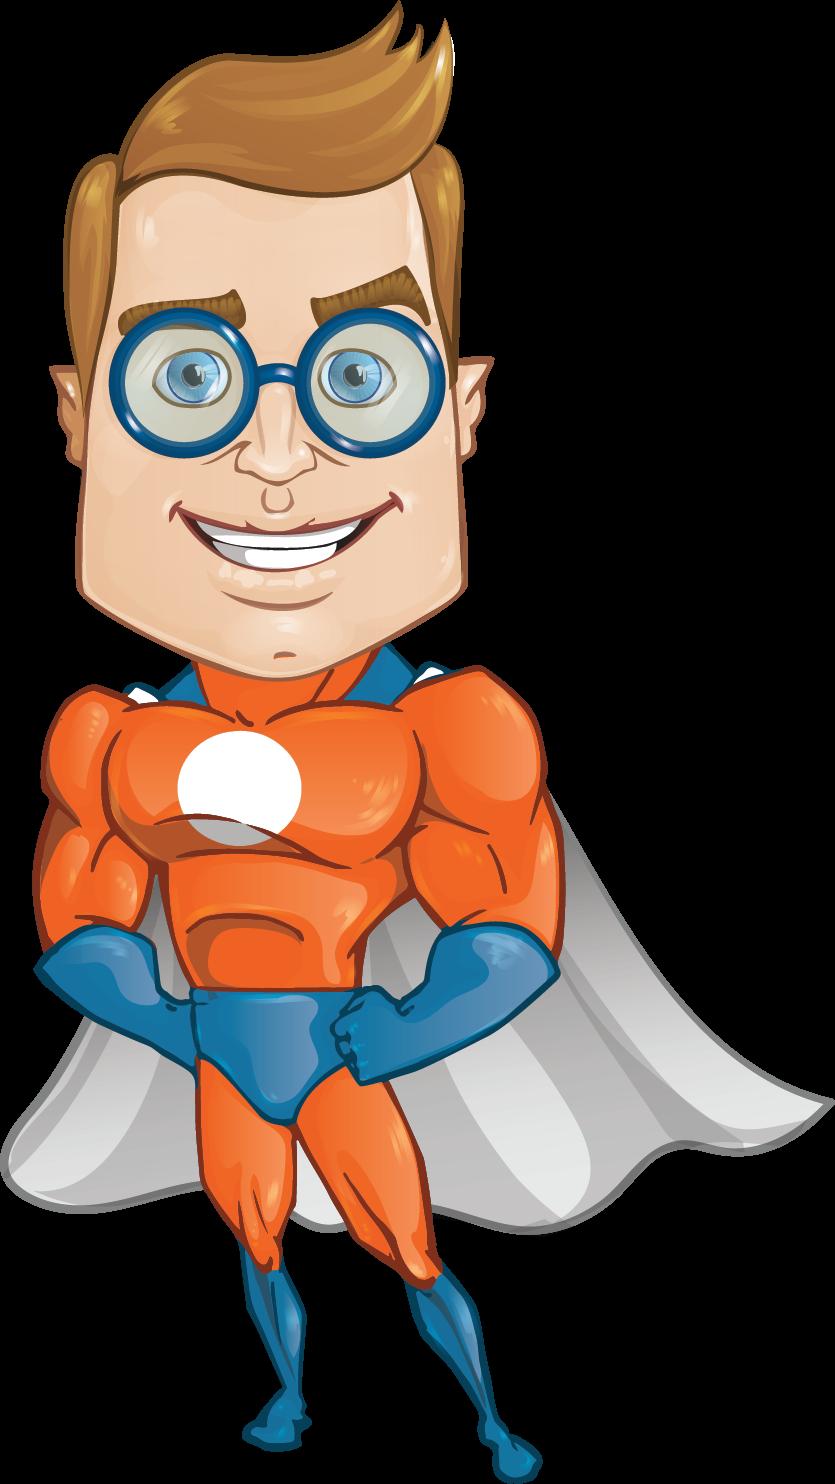 Free Comic Superhero Cliparts, Download Free Clip Art, Free.